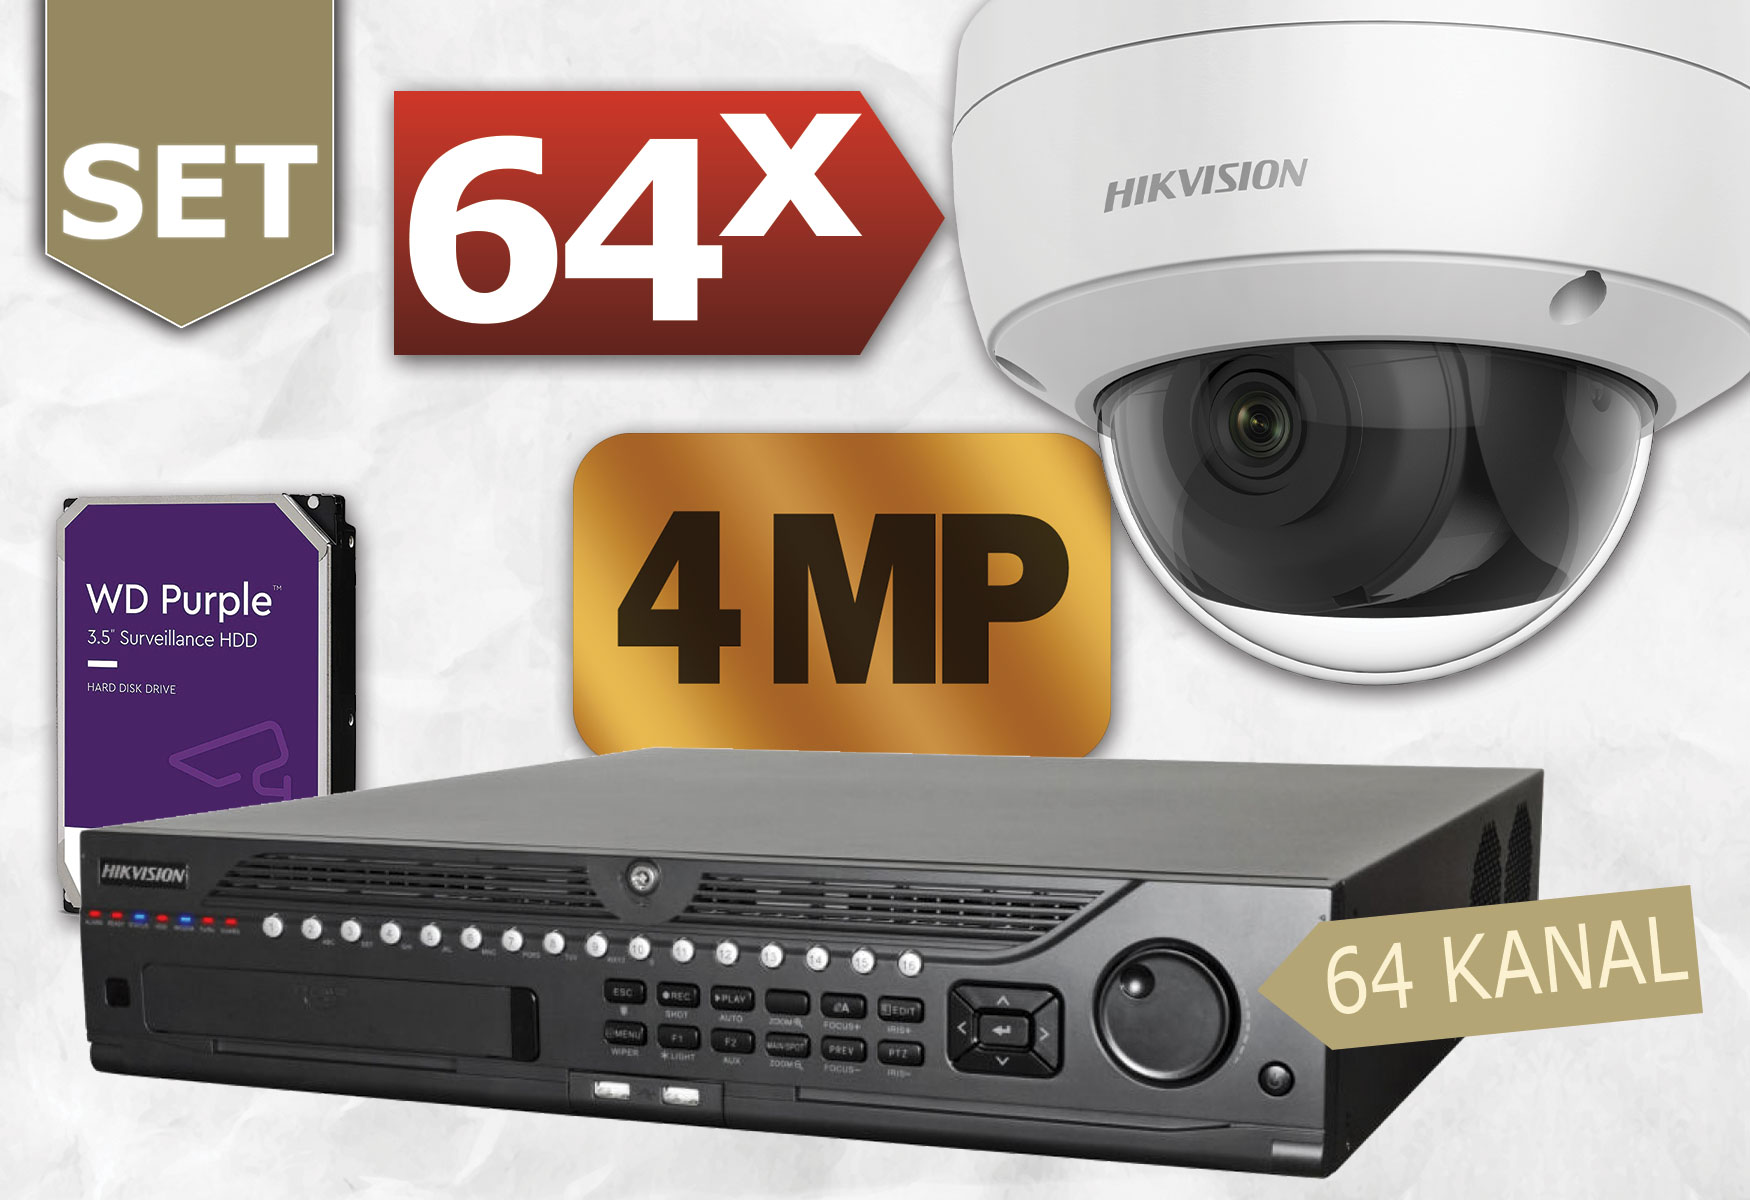 Ueberwachung-64Kanal-64x-Dome-4MP-Produkt-Grafiken-Ueberwachungskamer-Sets-ab-16-Kameras-IP.jpg